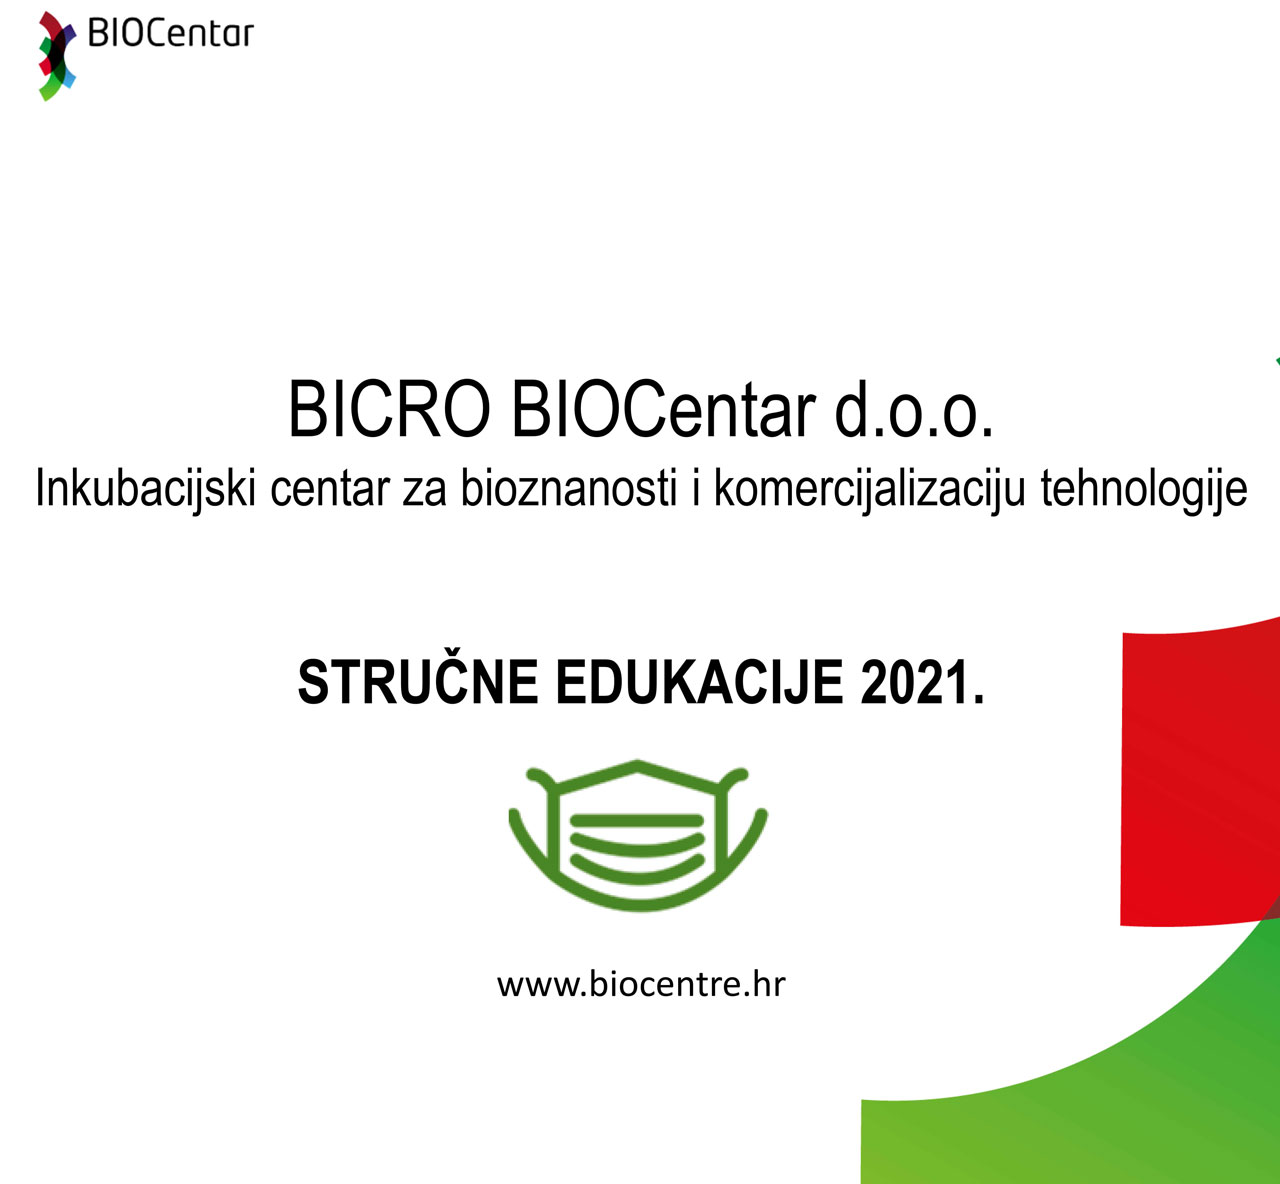 2021 BICRO BIOCentar Plan Edukacija 4